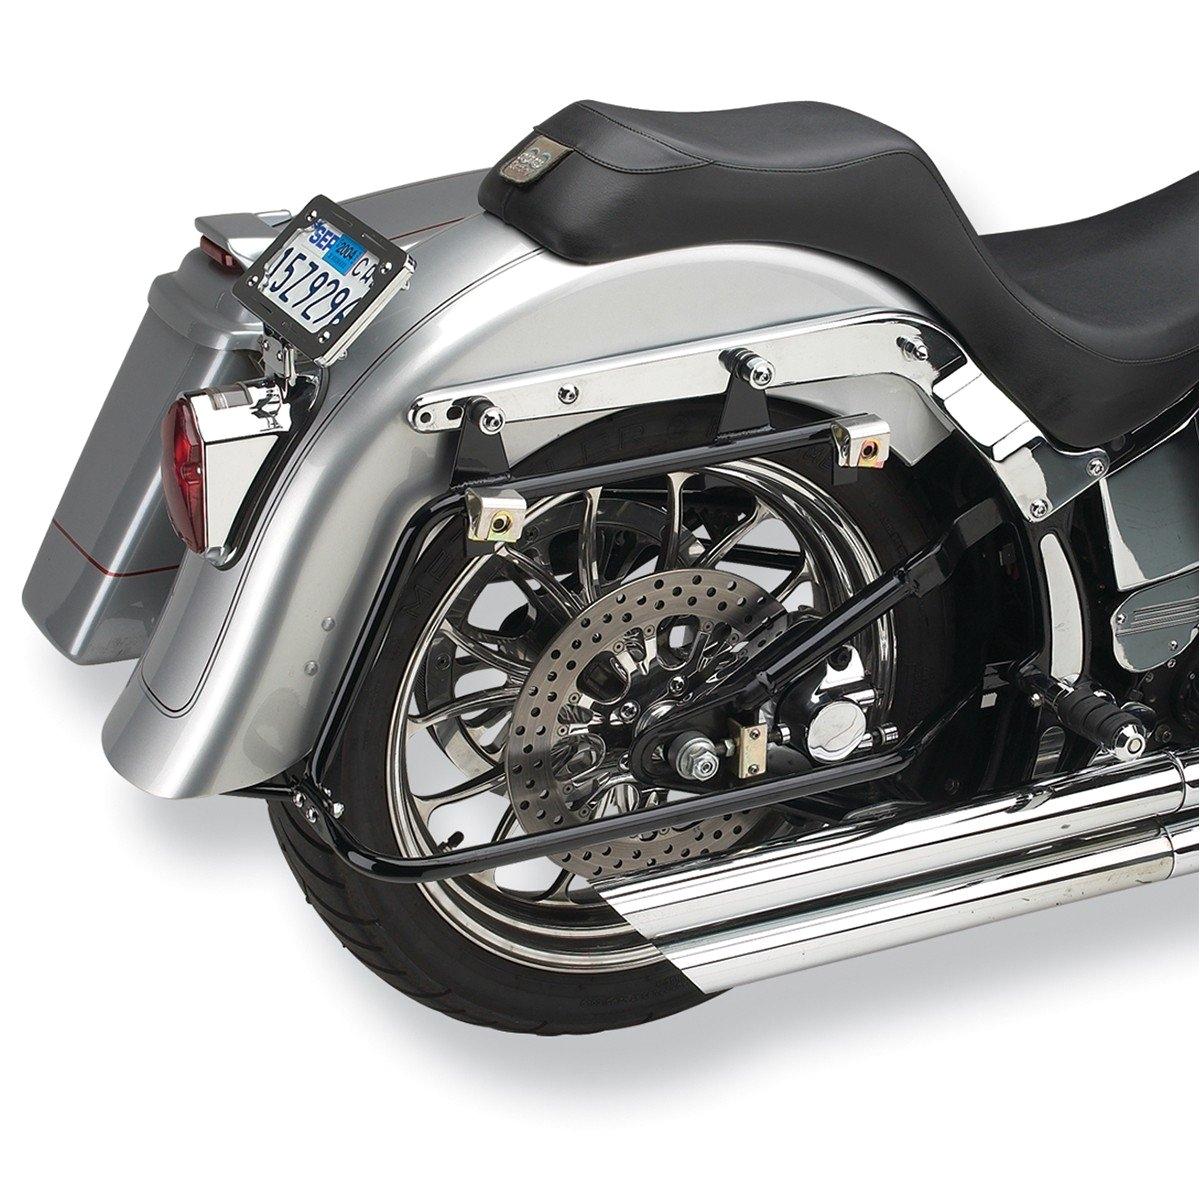 baggertail softail onbike 1200x1200